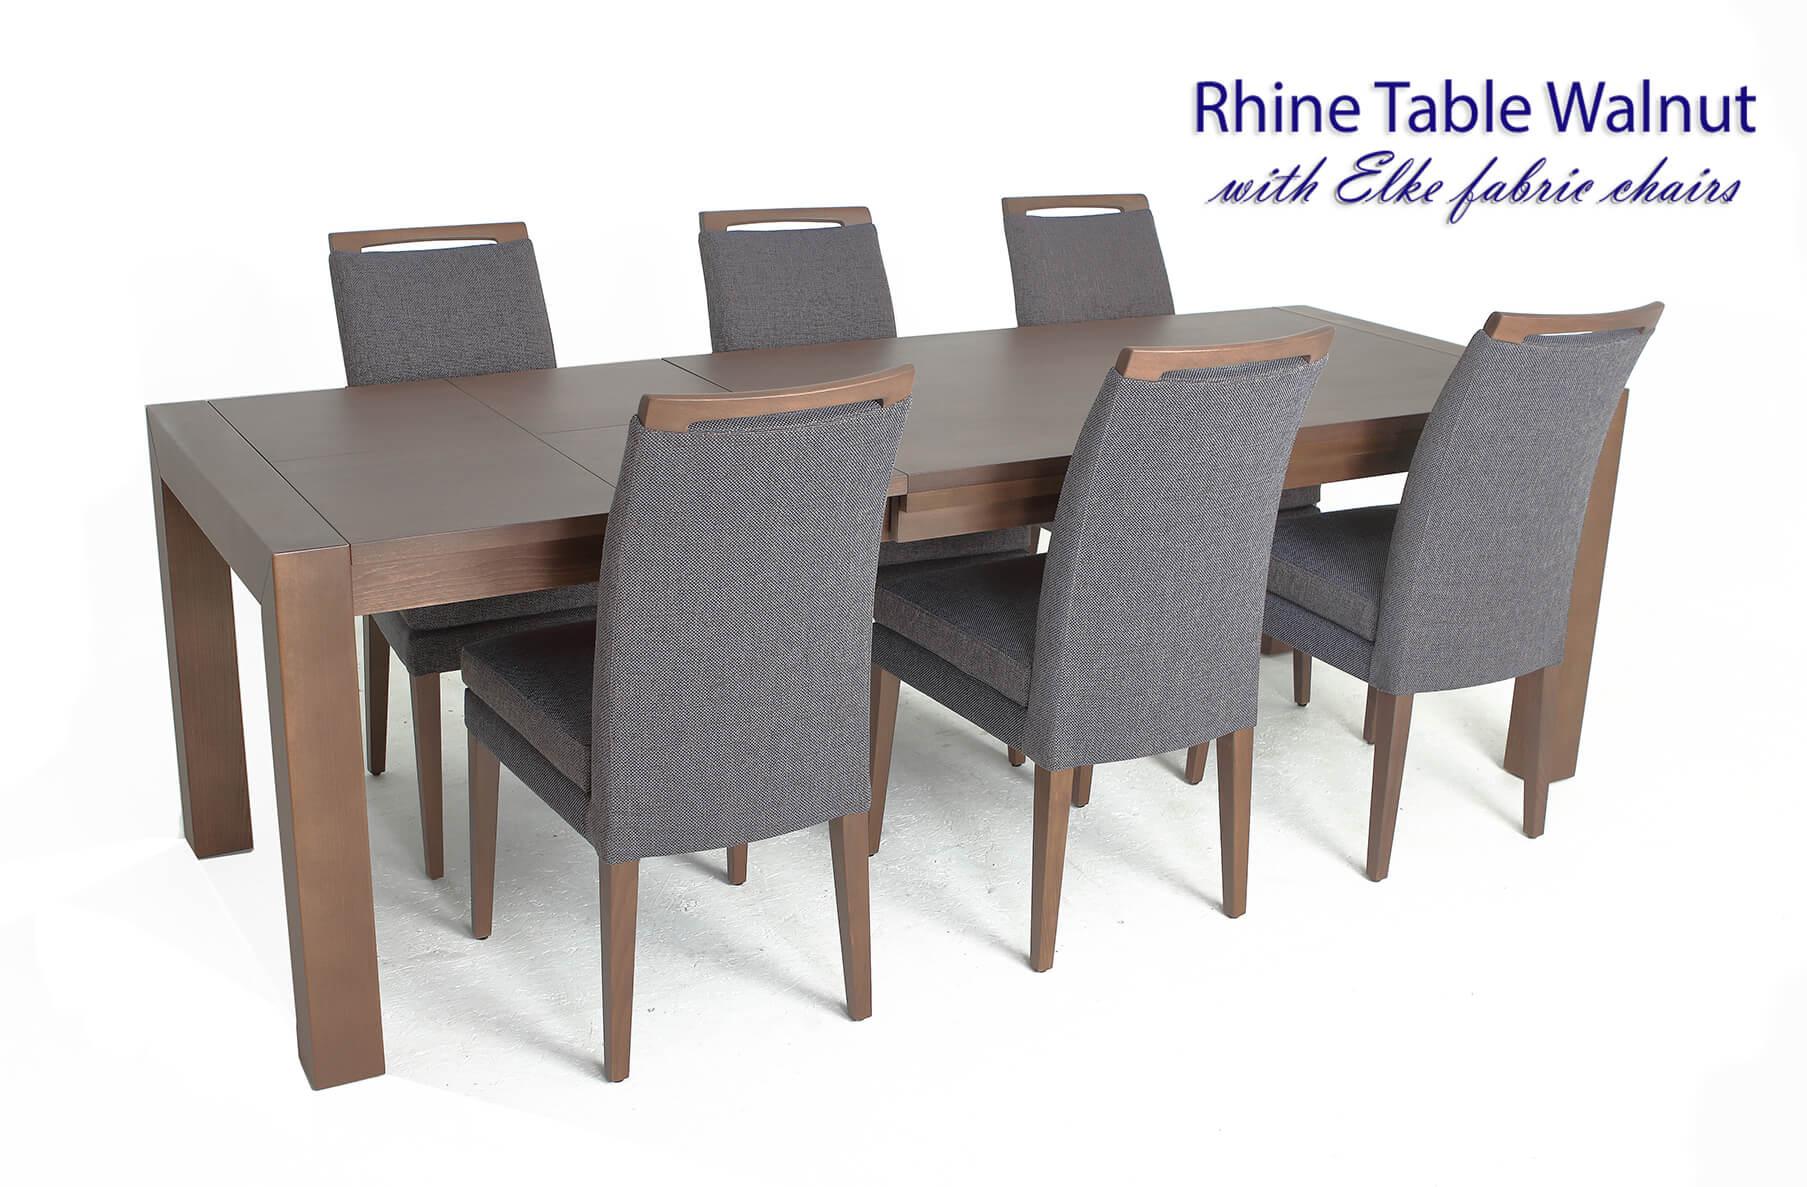 Rhine Walnut Table with Elke fabric chairs, Cheap